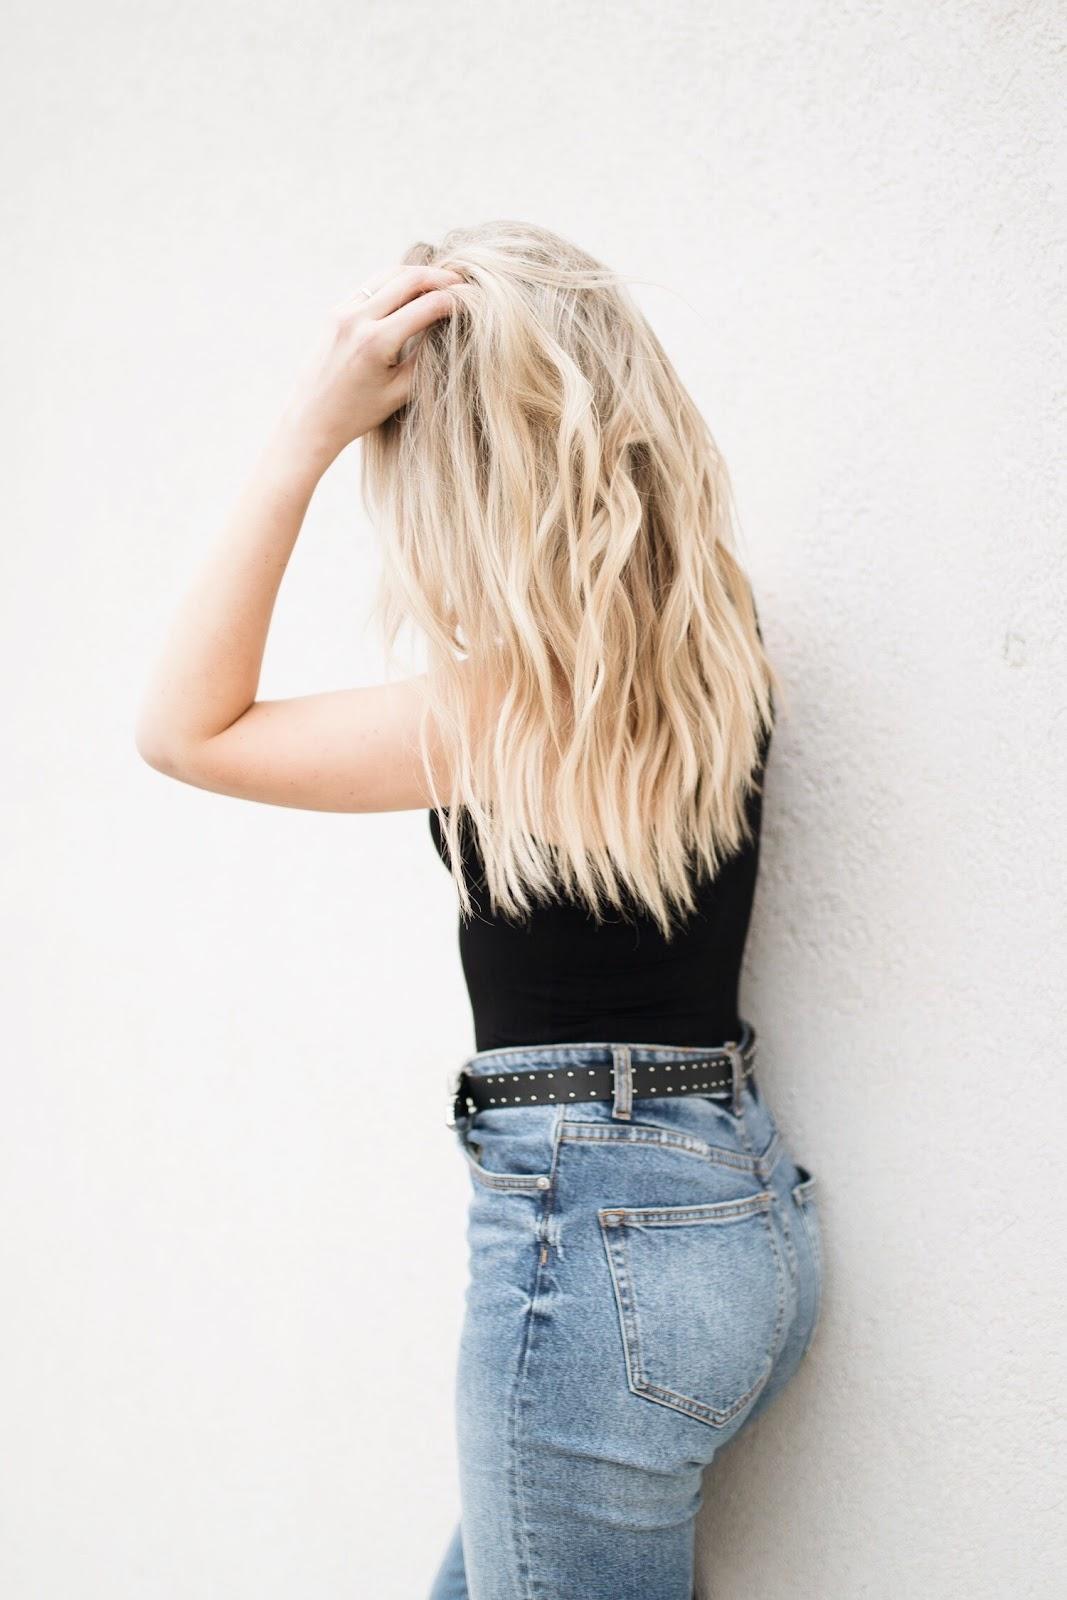 blonde wavy hair, high-waisted gf jeans